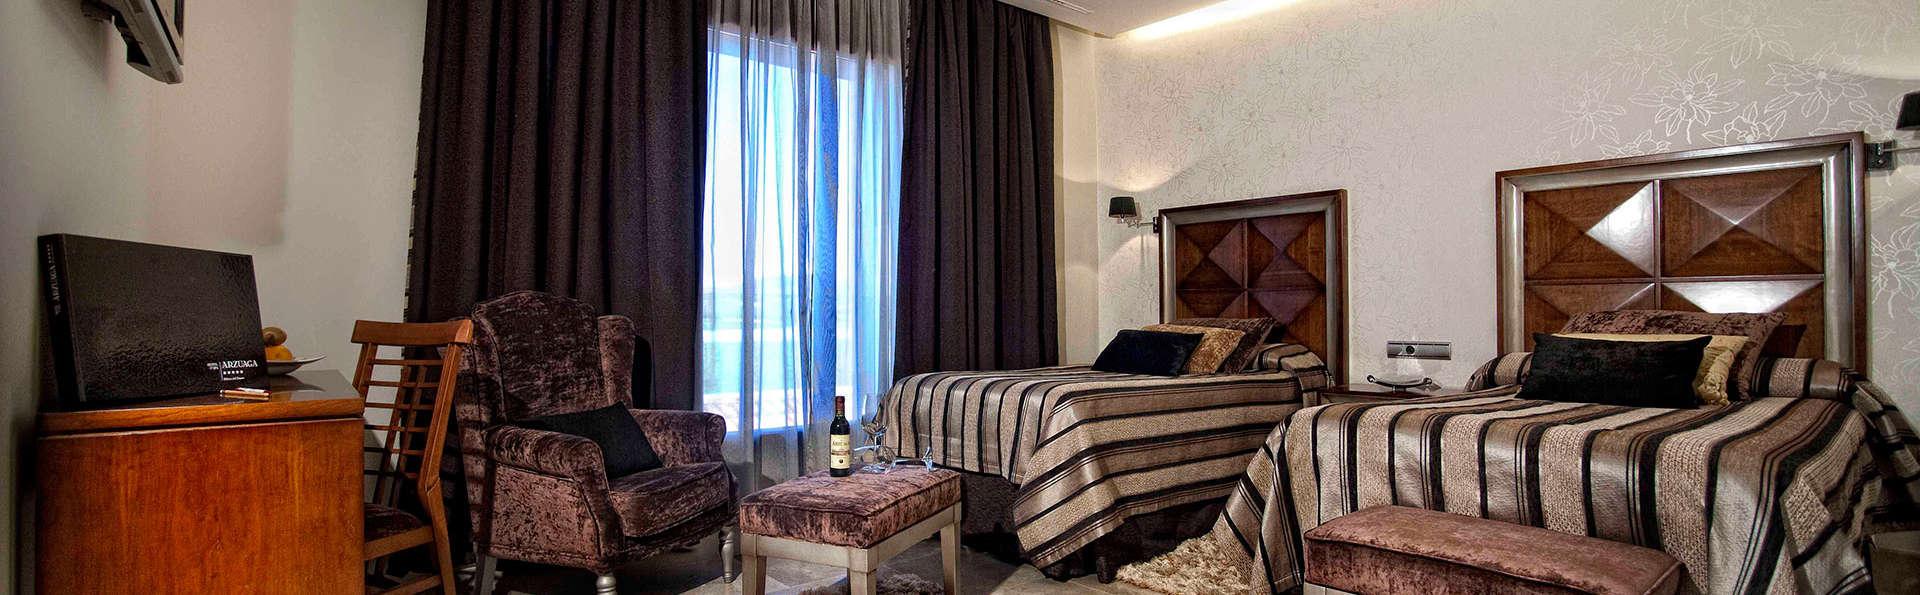 Hotel & Spa Arzuaga - EDIT_room2.jpg